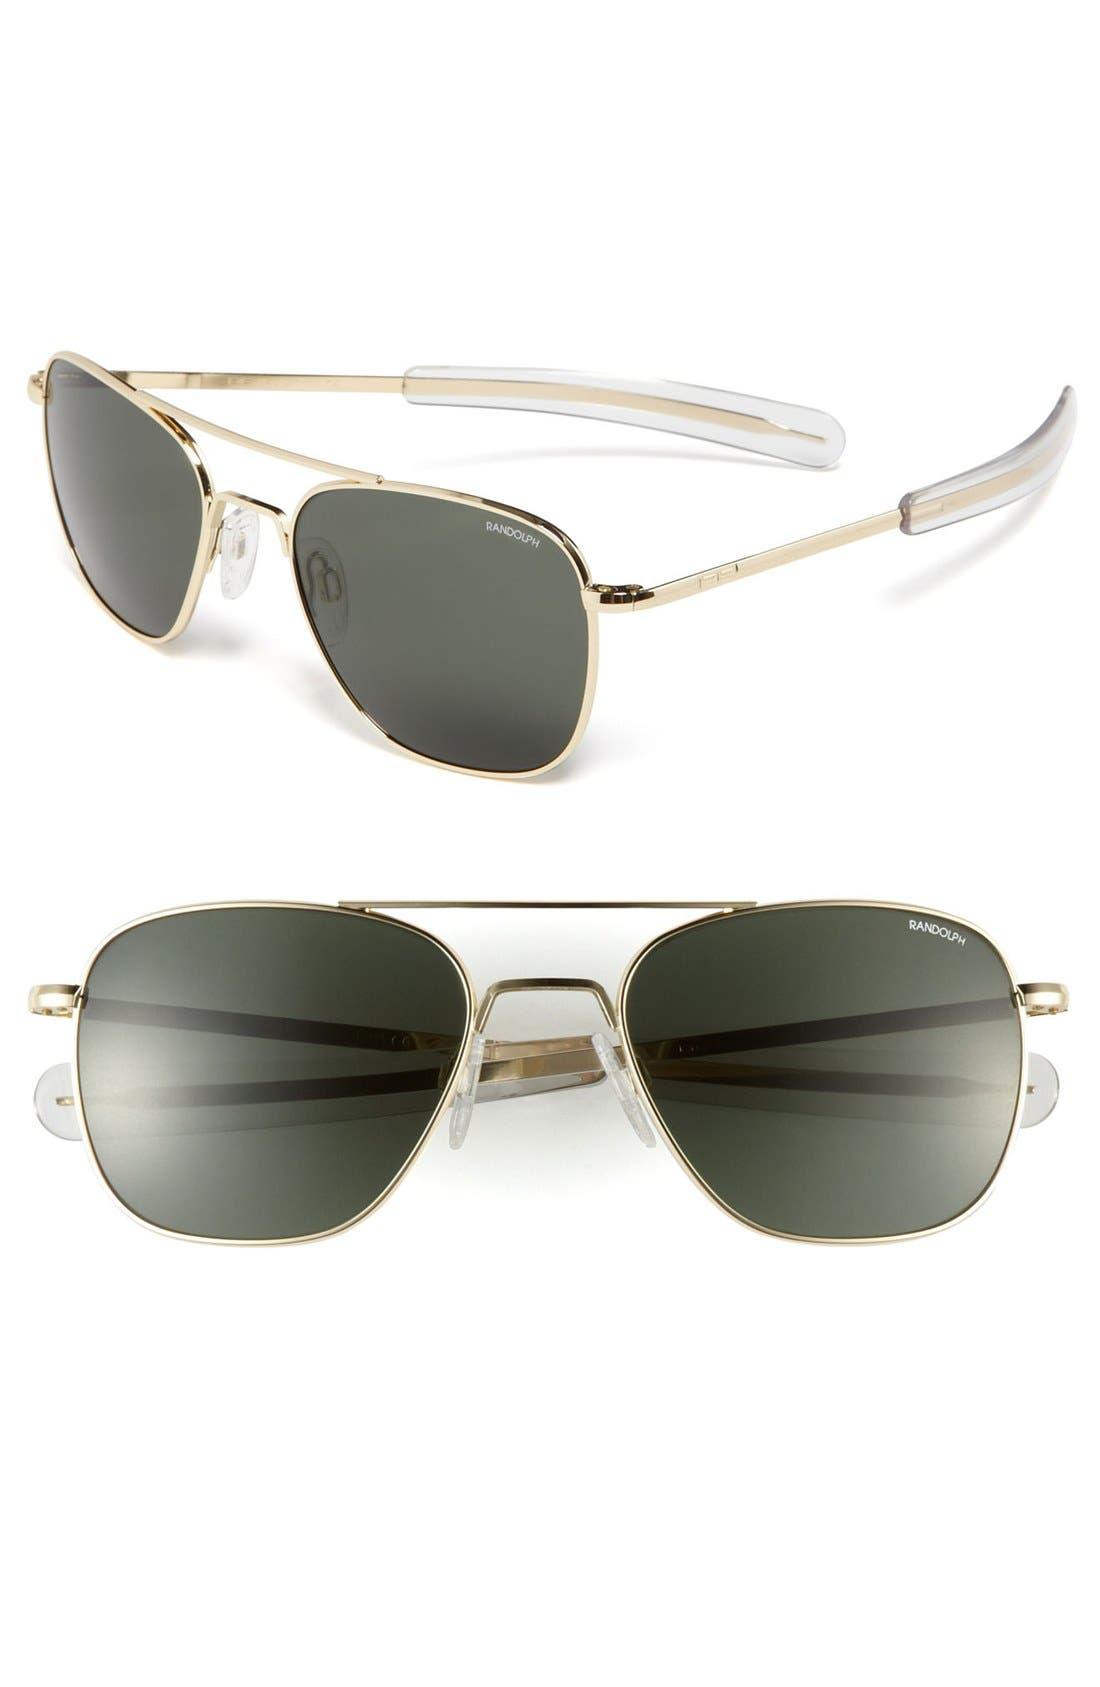 55mm Aviator Sunglasses,                         Main,                         color, Gold/ Agx